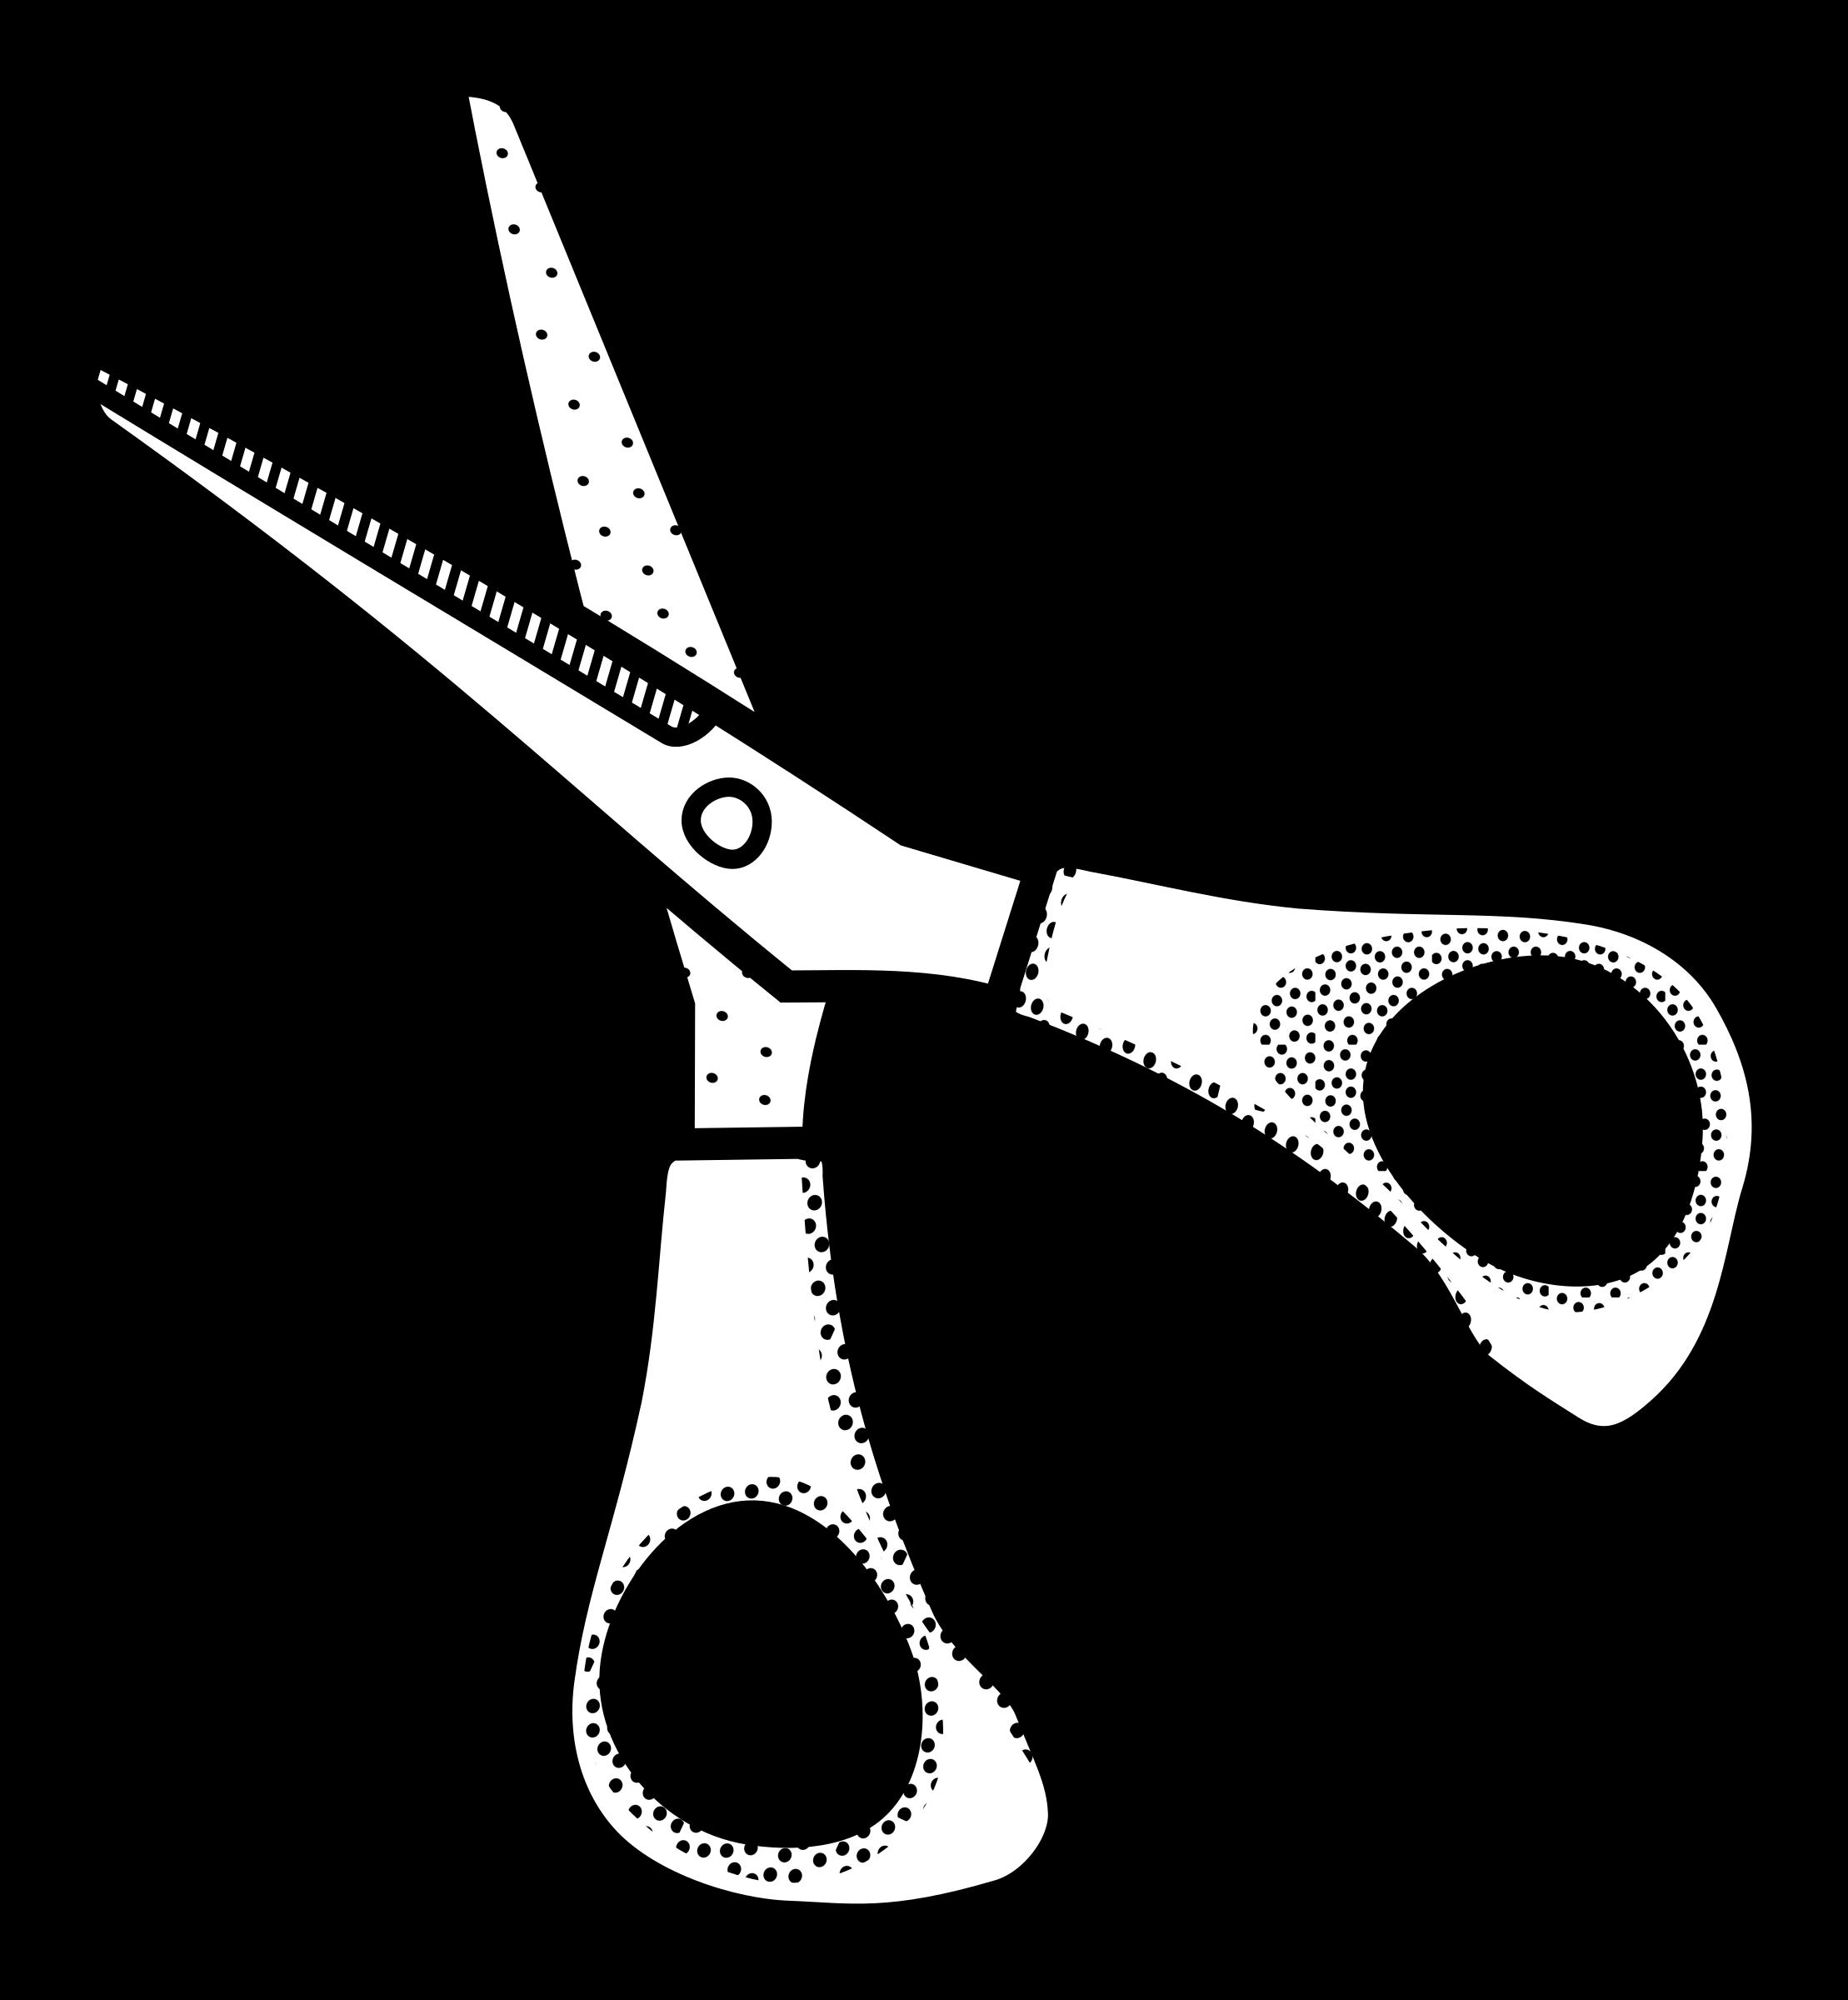 Black and white scissors clipart jpg freeuse Scissors clipart black and white 9 » Clipart Station jpg freeuse